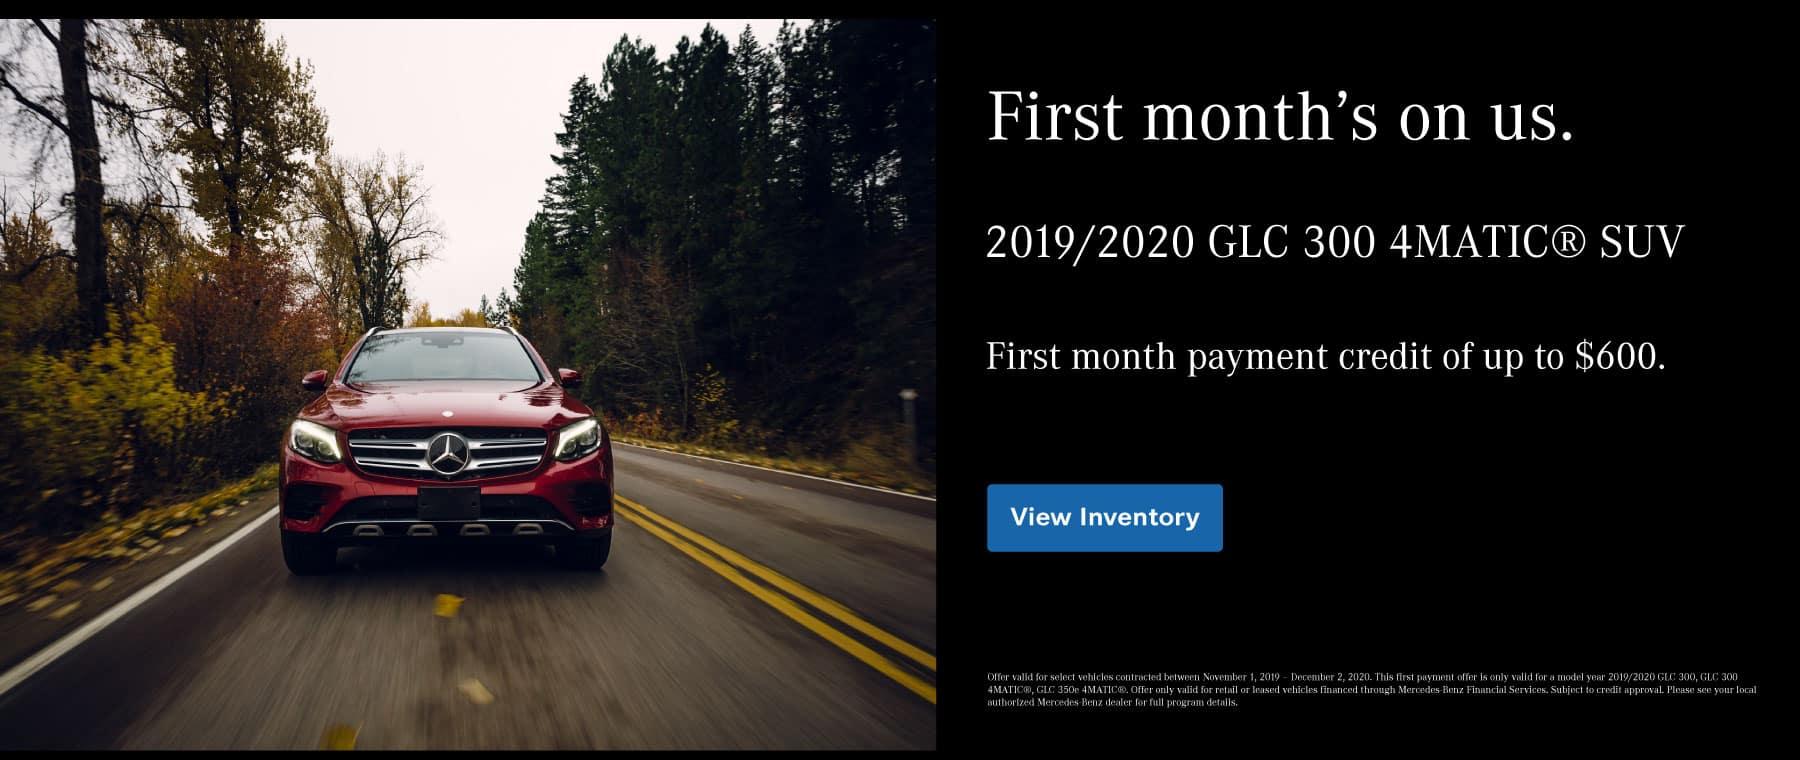 GLC Payment Credit